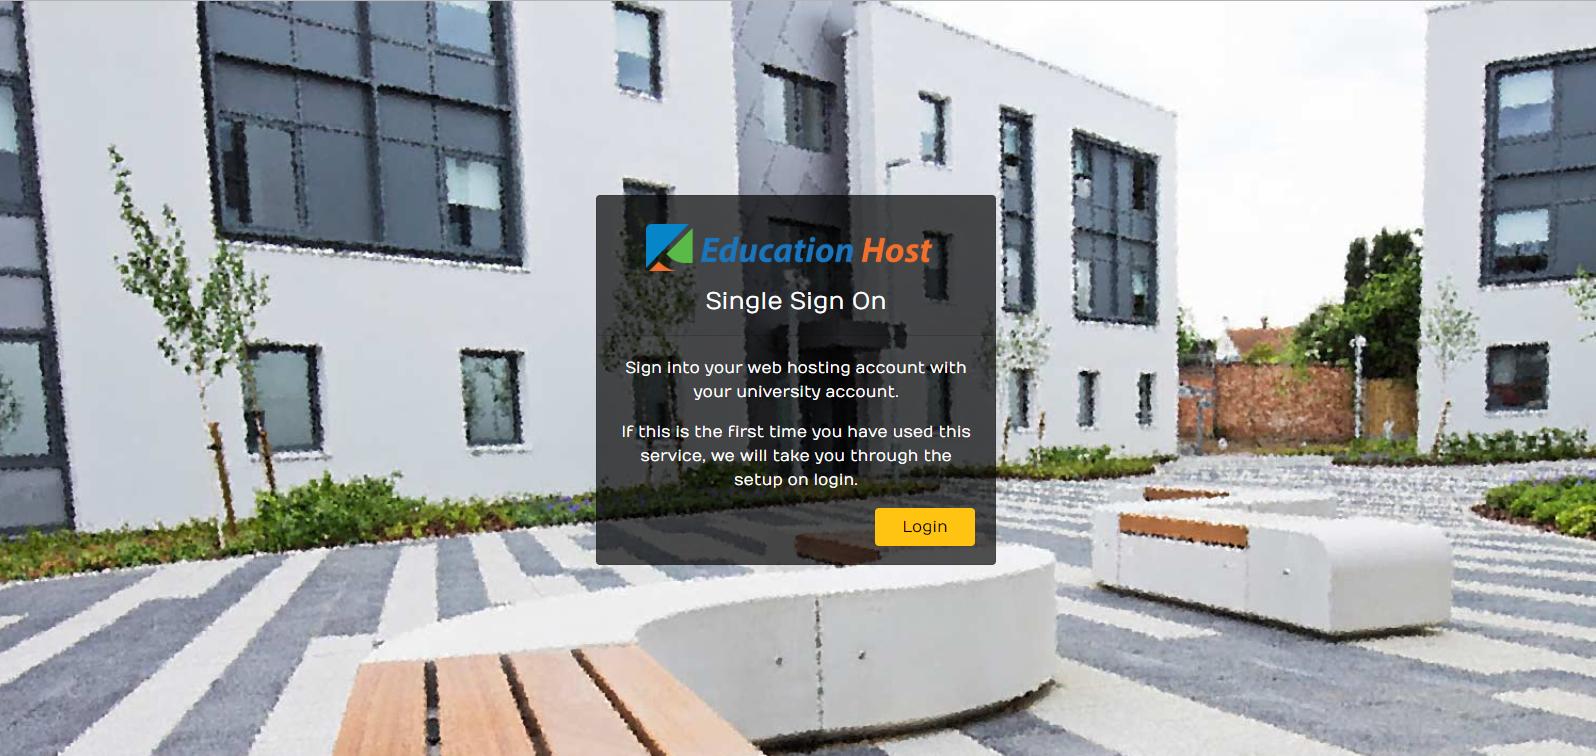 Education Host - Student web hosting single sign on